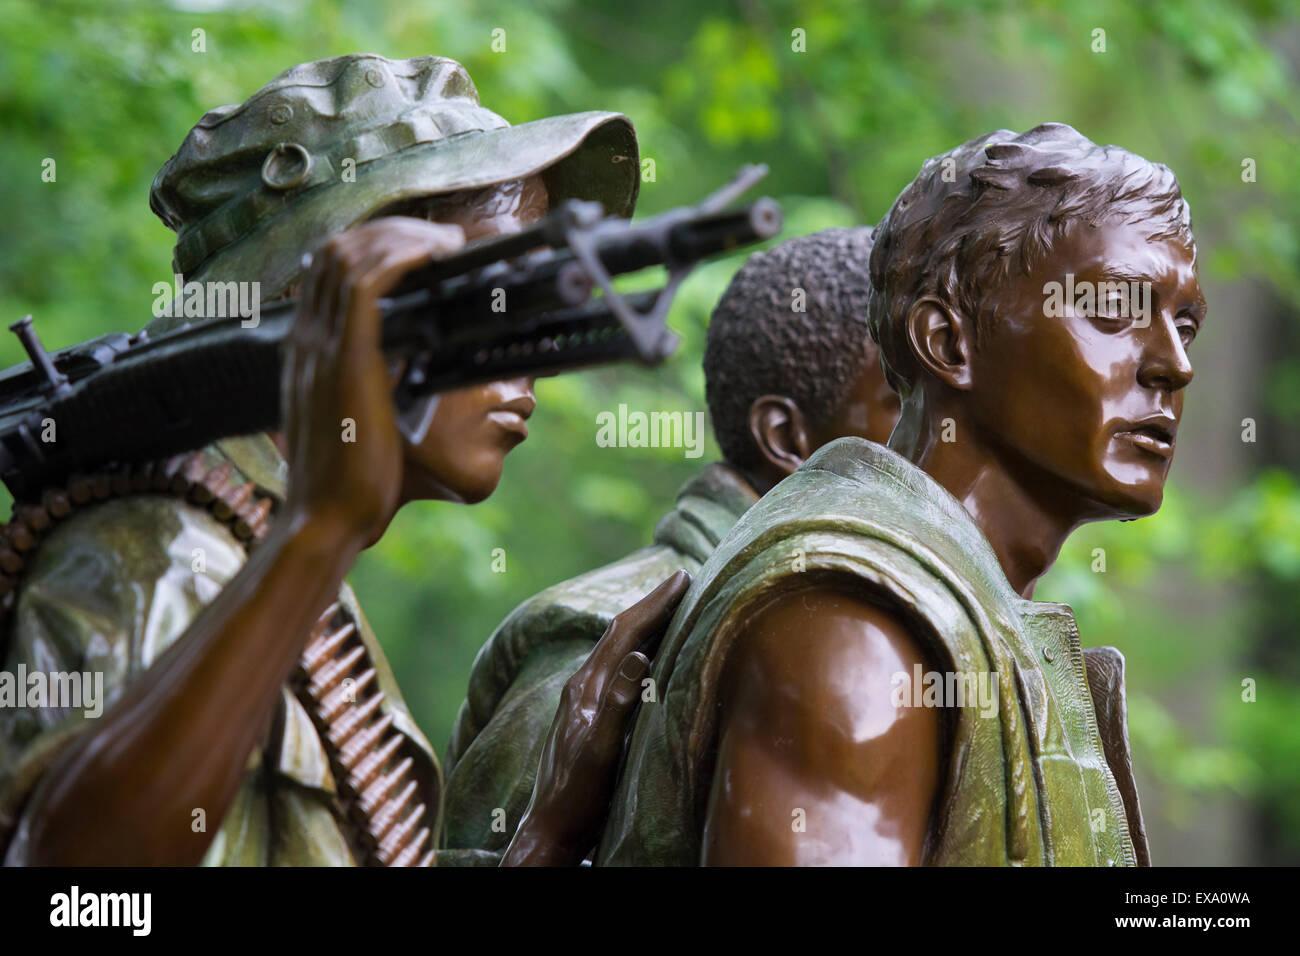 Vietnam War Veterans Memorial Statue, Three Servicemen Washington DC - Stock Image